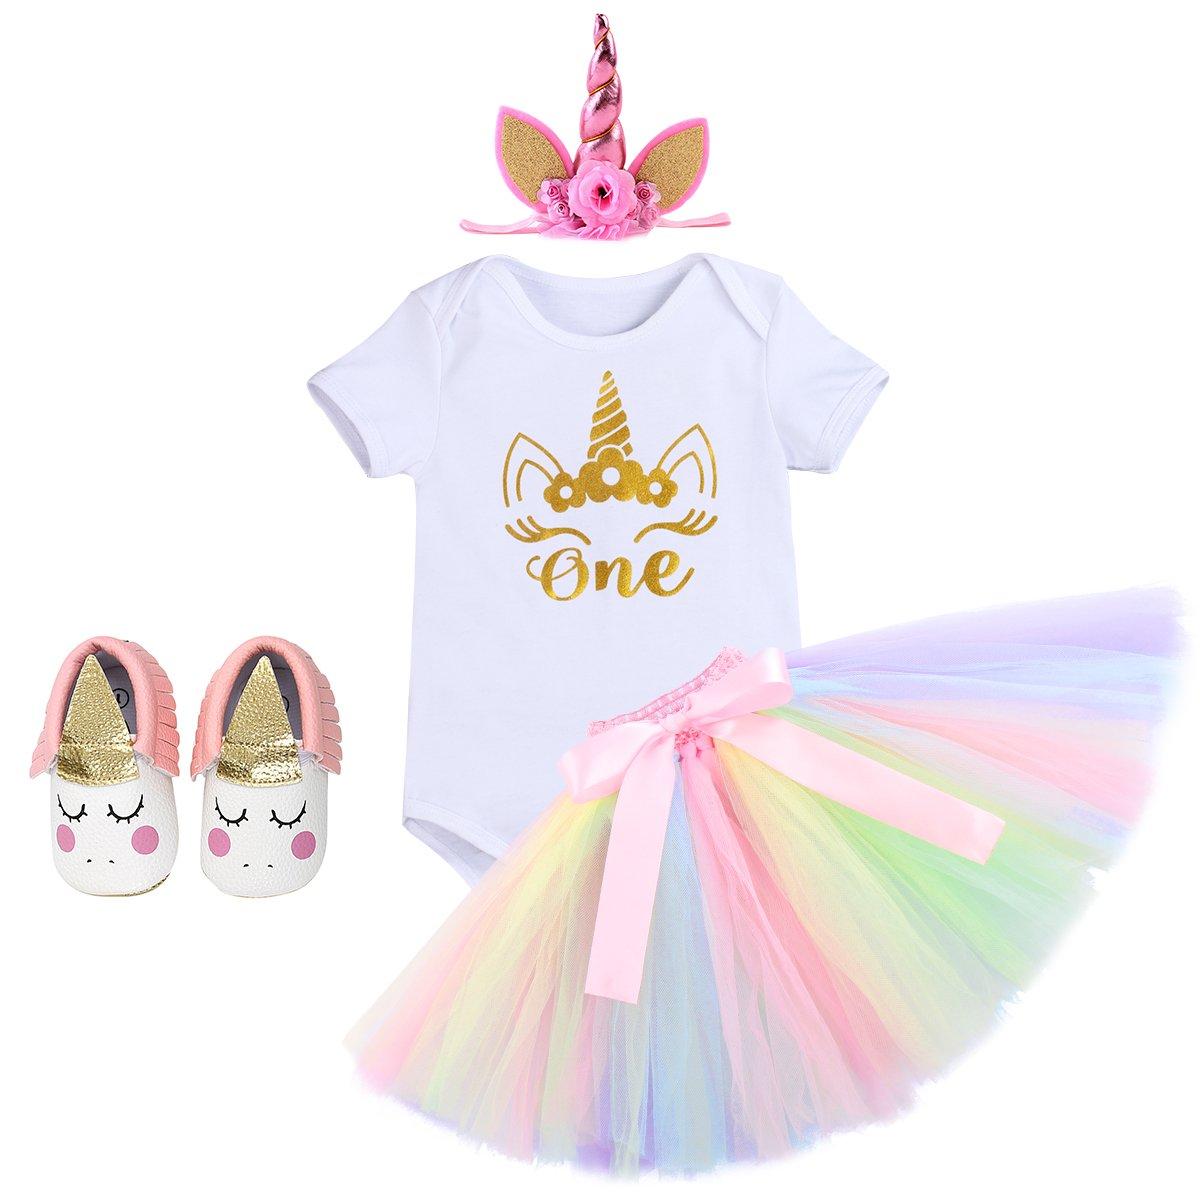 OBEEII Baby Girl 4PCS Birthday Outfit Romper Rainbow Tutu Skirt Shoes Unicorn Headband